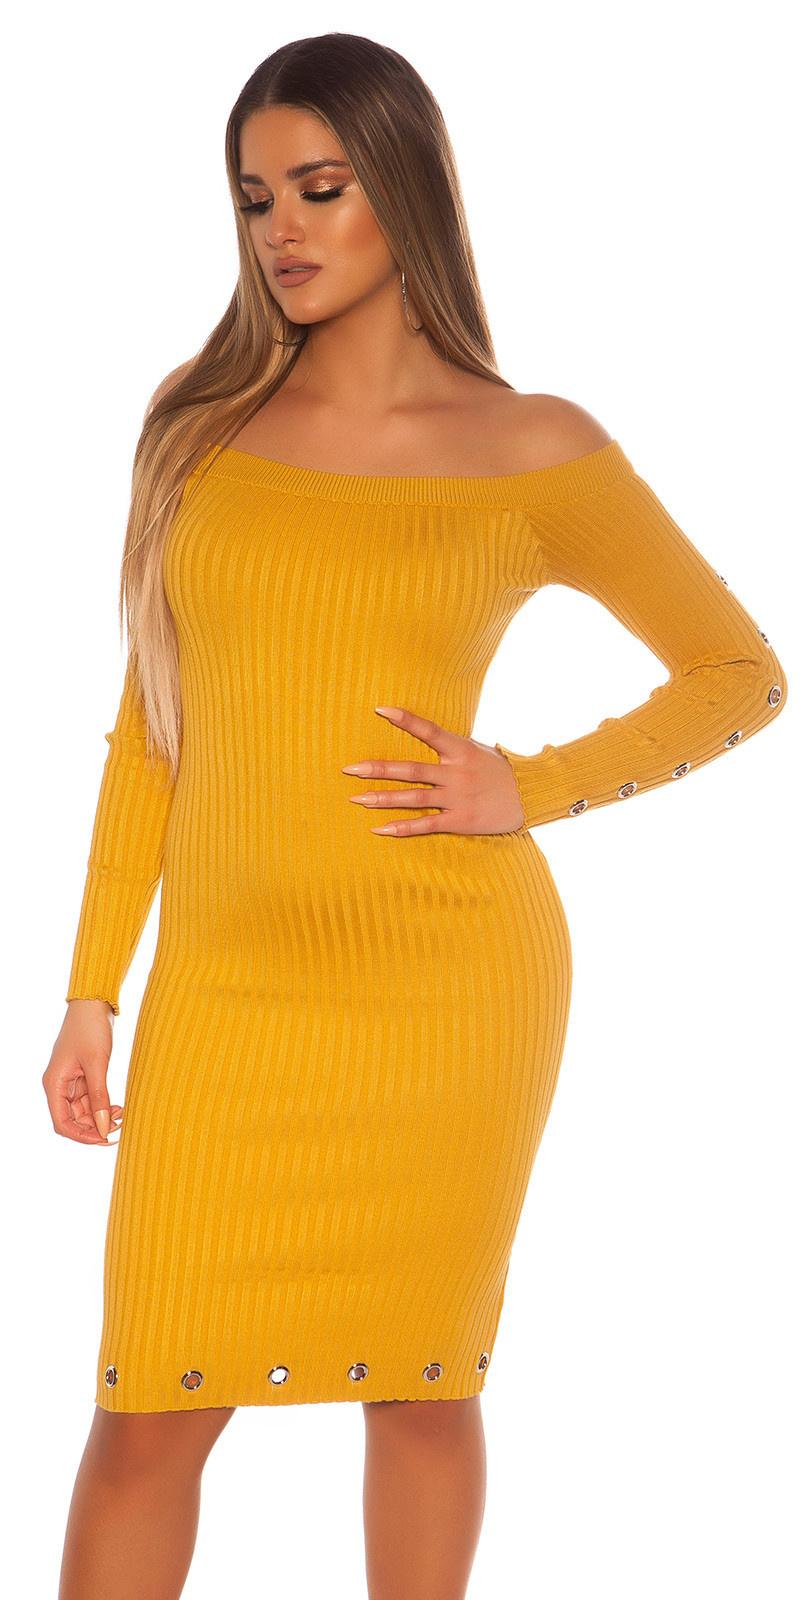 Sexy geribbelde gebreide jurk met oogjes mosterdgeel